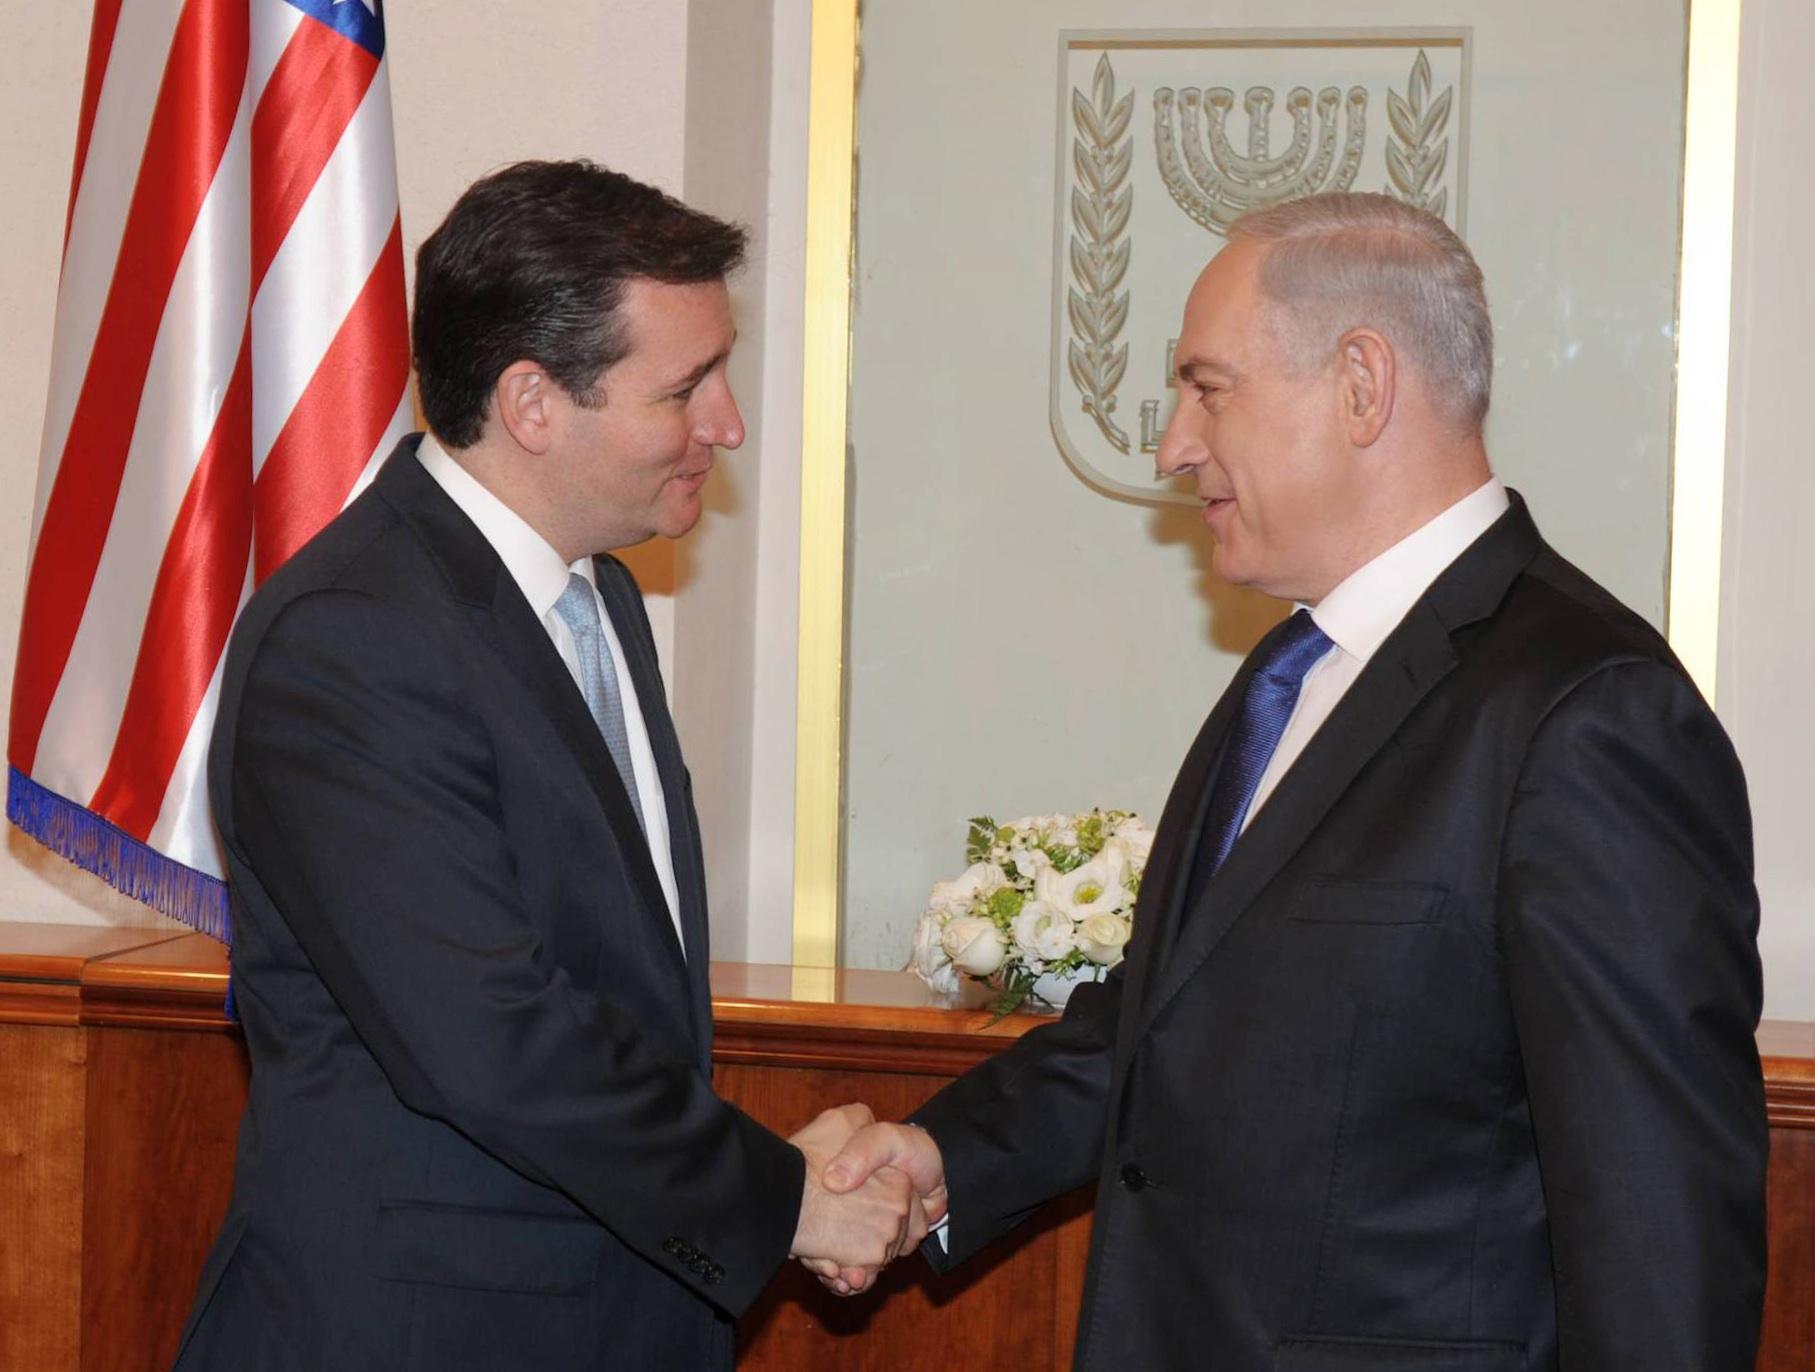 Click photo to download. Caption: Israeli Prime Minister Benjamin Netanyahu (right) meets with U.S. Sen. Ted Cruz (R-TX) at Netanyahu's office in Jerusalem on December 17, 2012. Credit: Amos Ben Gershom/GPO/Flash90.